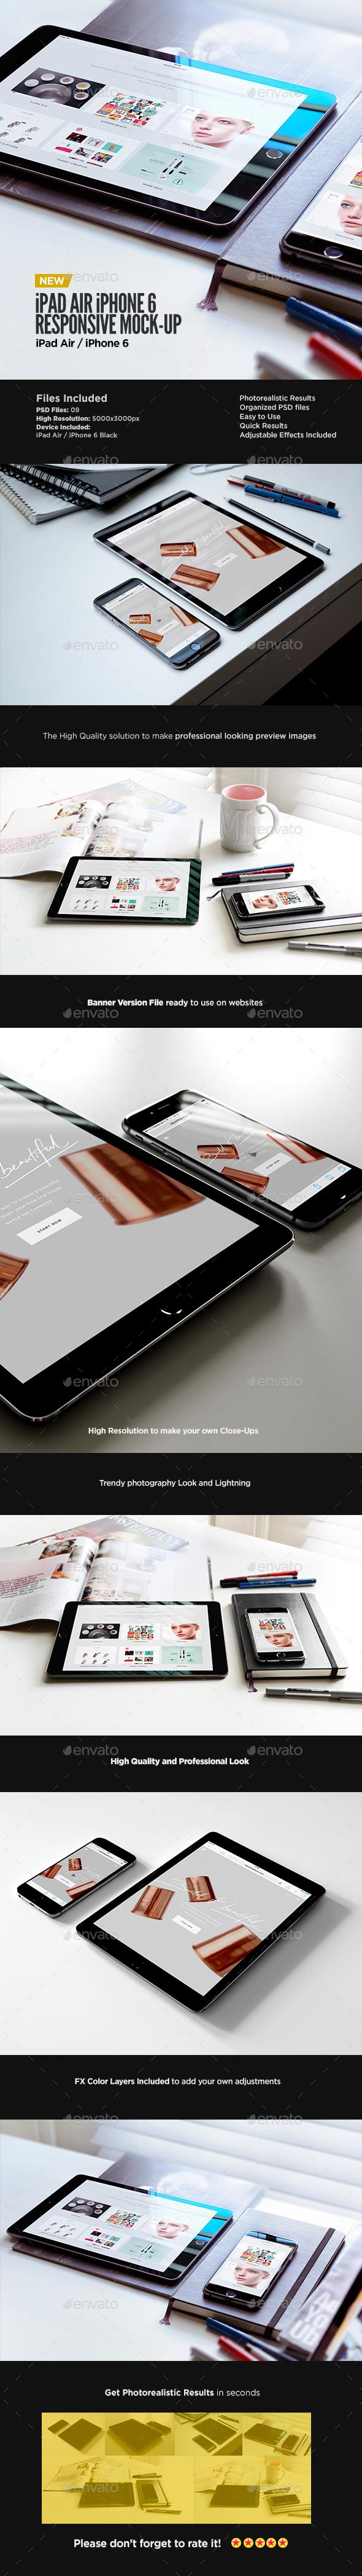 Tablet iPad Air iPhone 6 Black Display Mock-Up  - Displays Product Mock-Ups